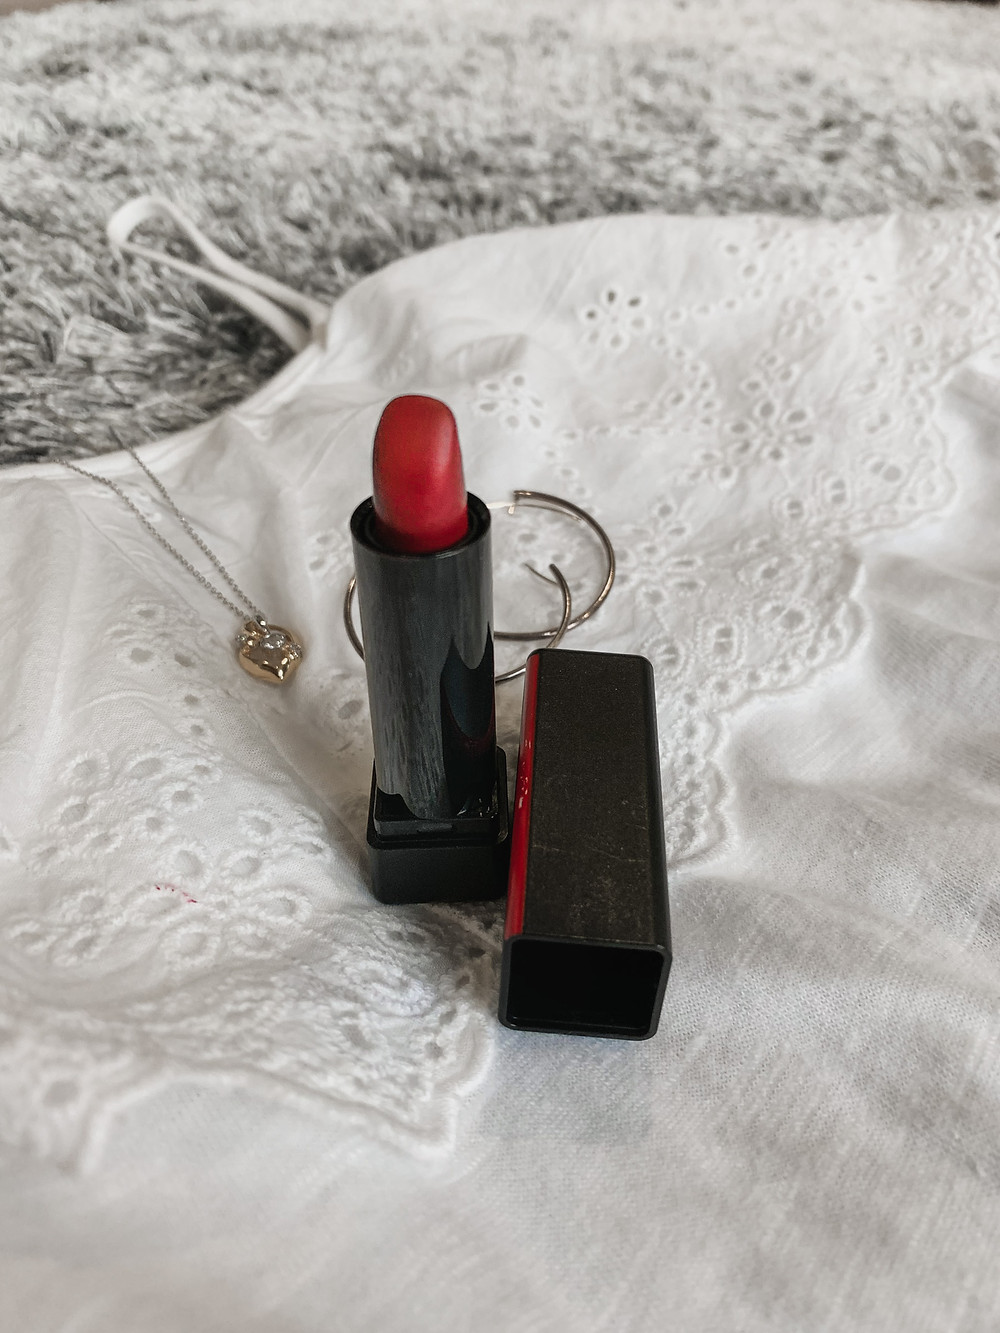 RollingbearTravels Blog / exotic red shiseido lipstick, plain hoop earrings, gold pendant necklace, lace detail